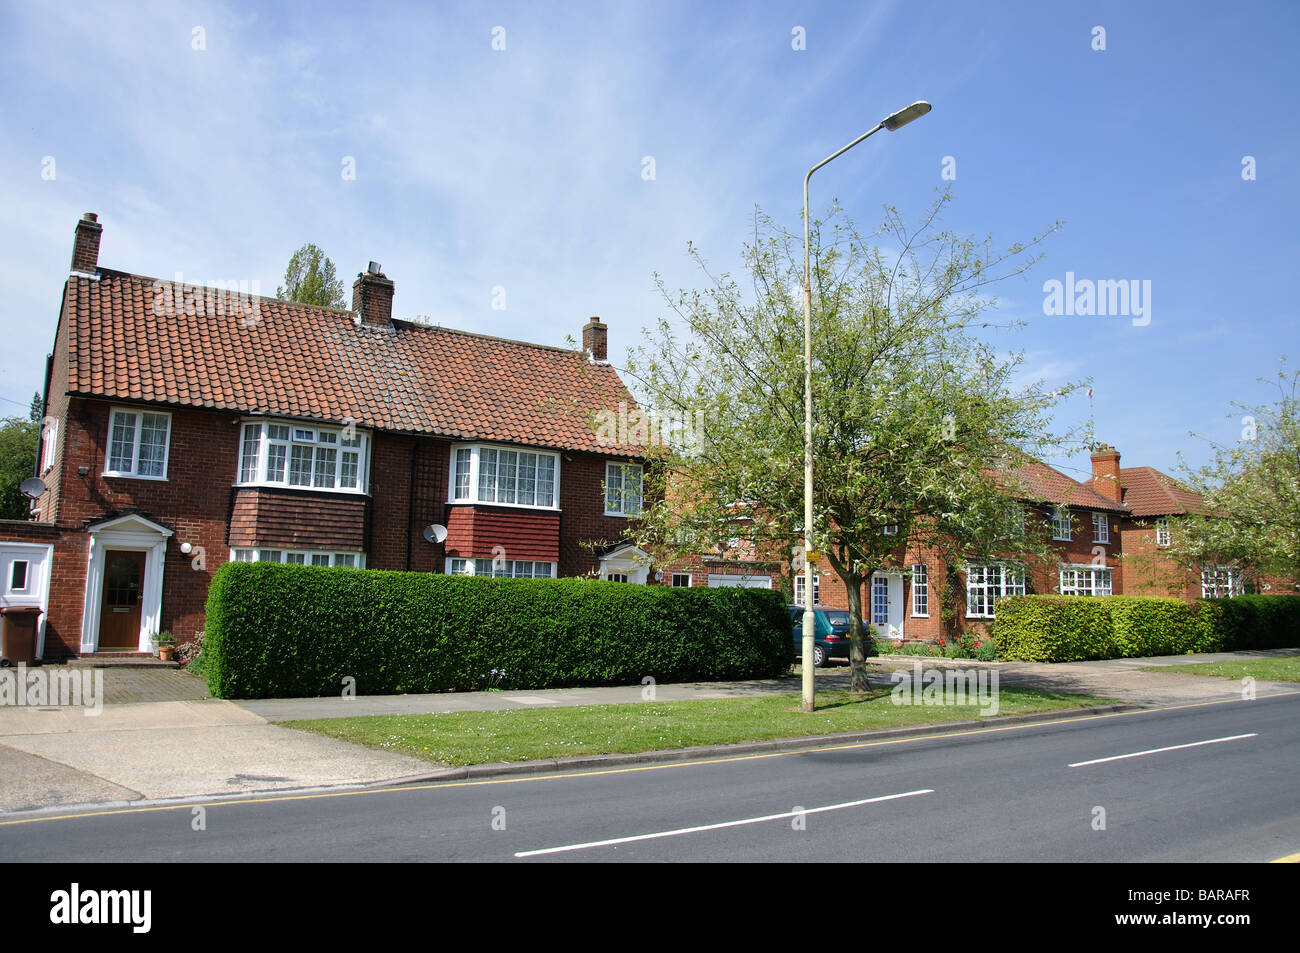 Typical Houses In Street Longcroft Lane Welwyn Garden City Stock Photo Royalty Free Image